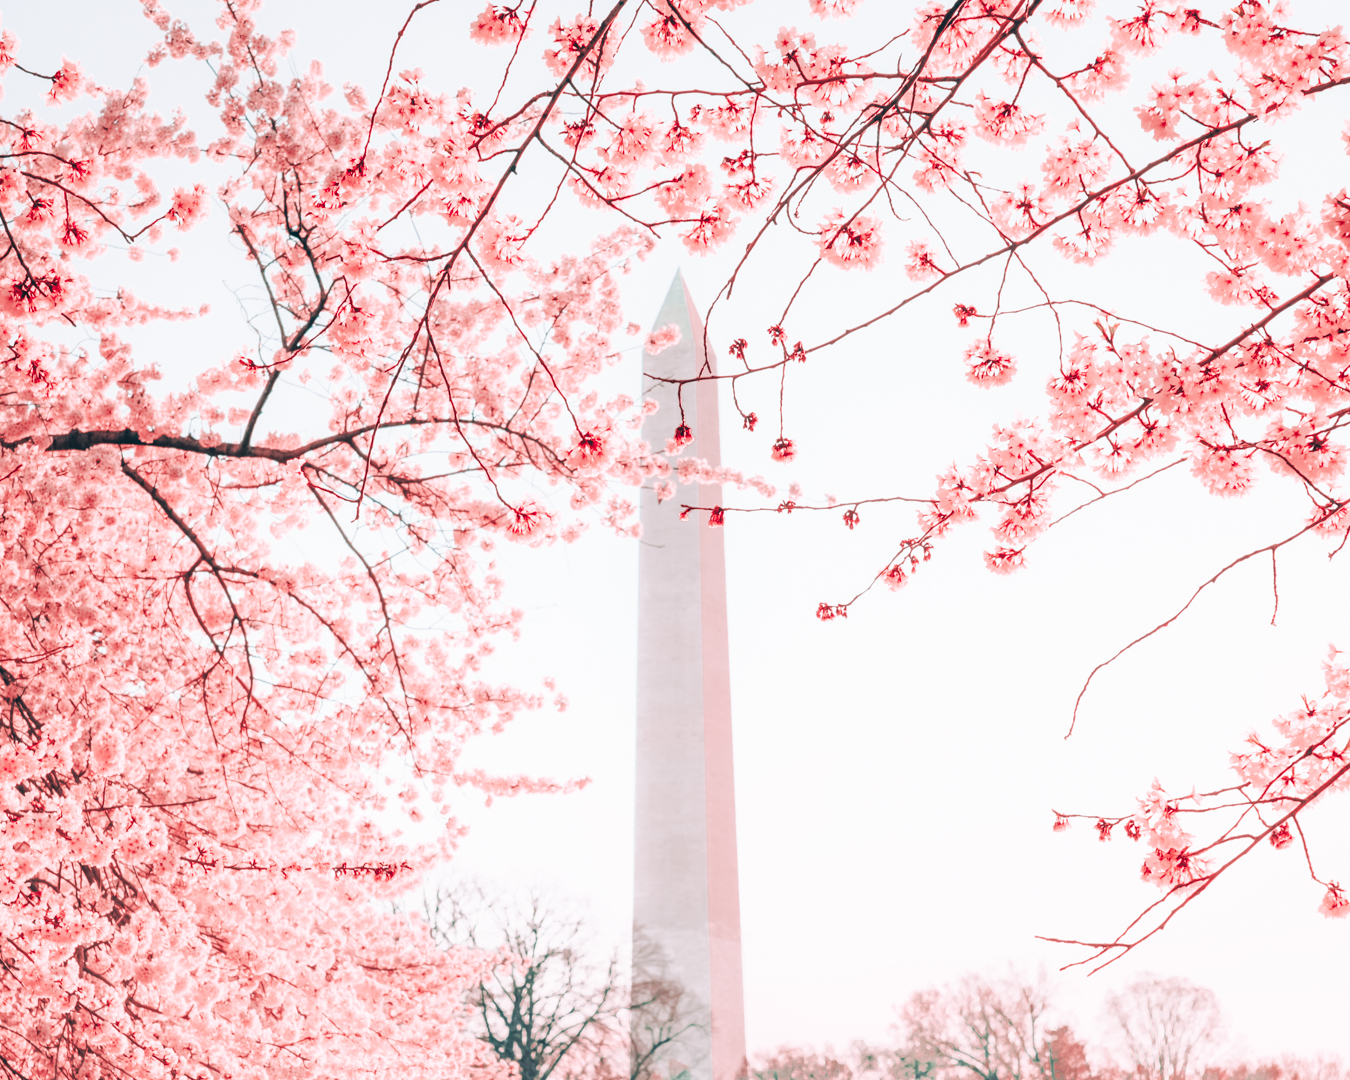 Blossoms at the Washington Monument